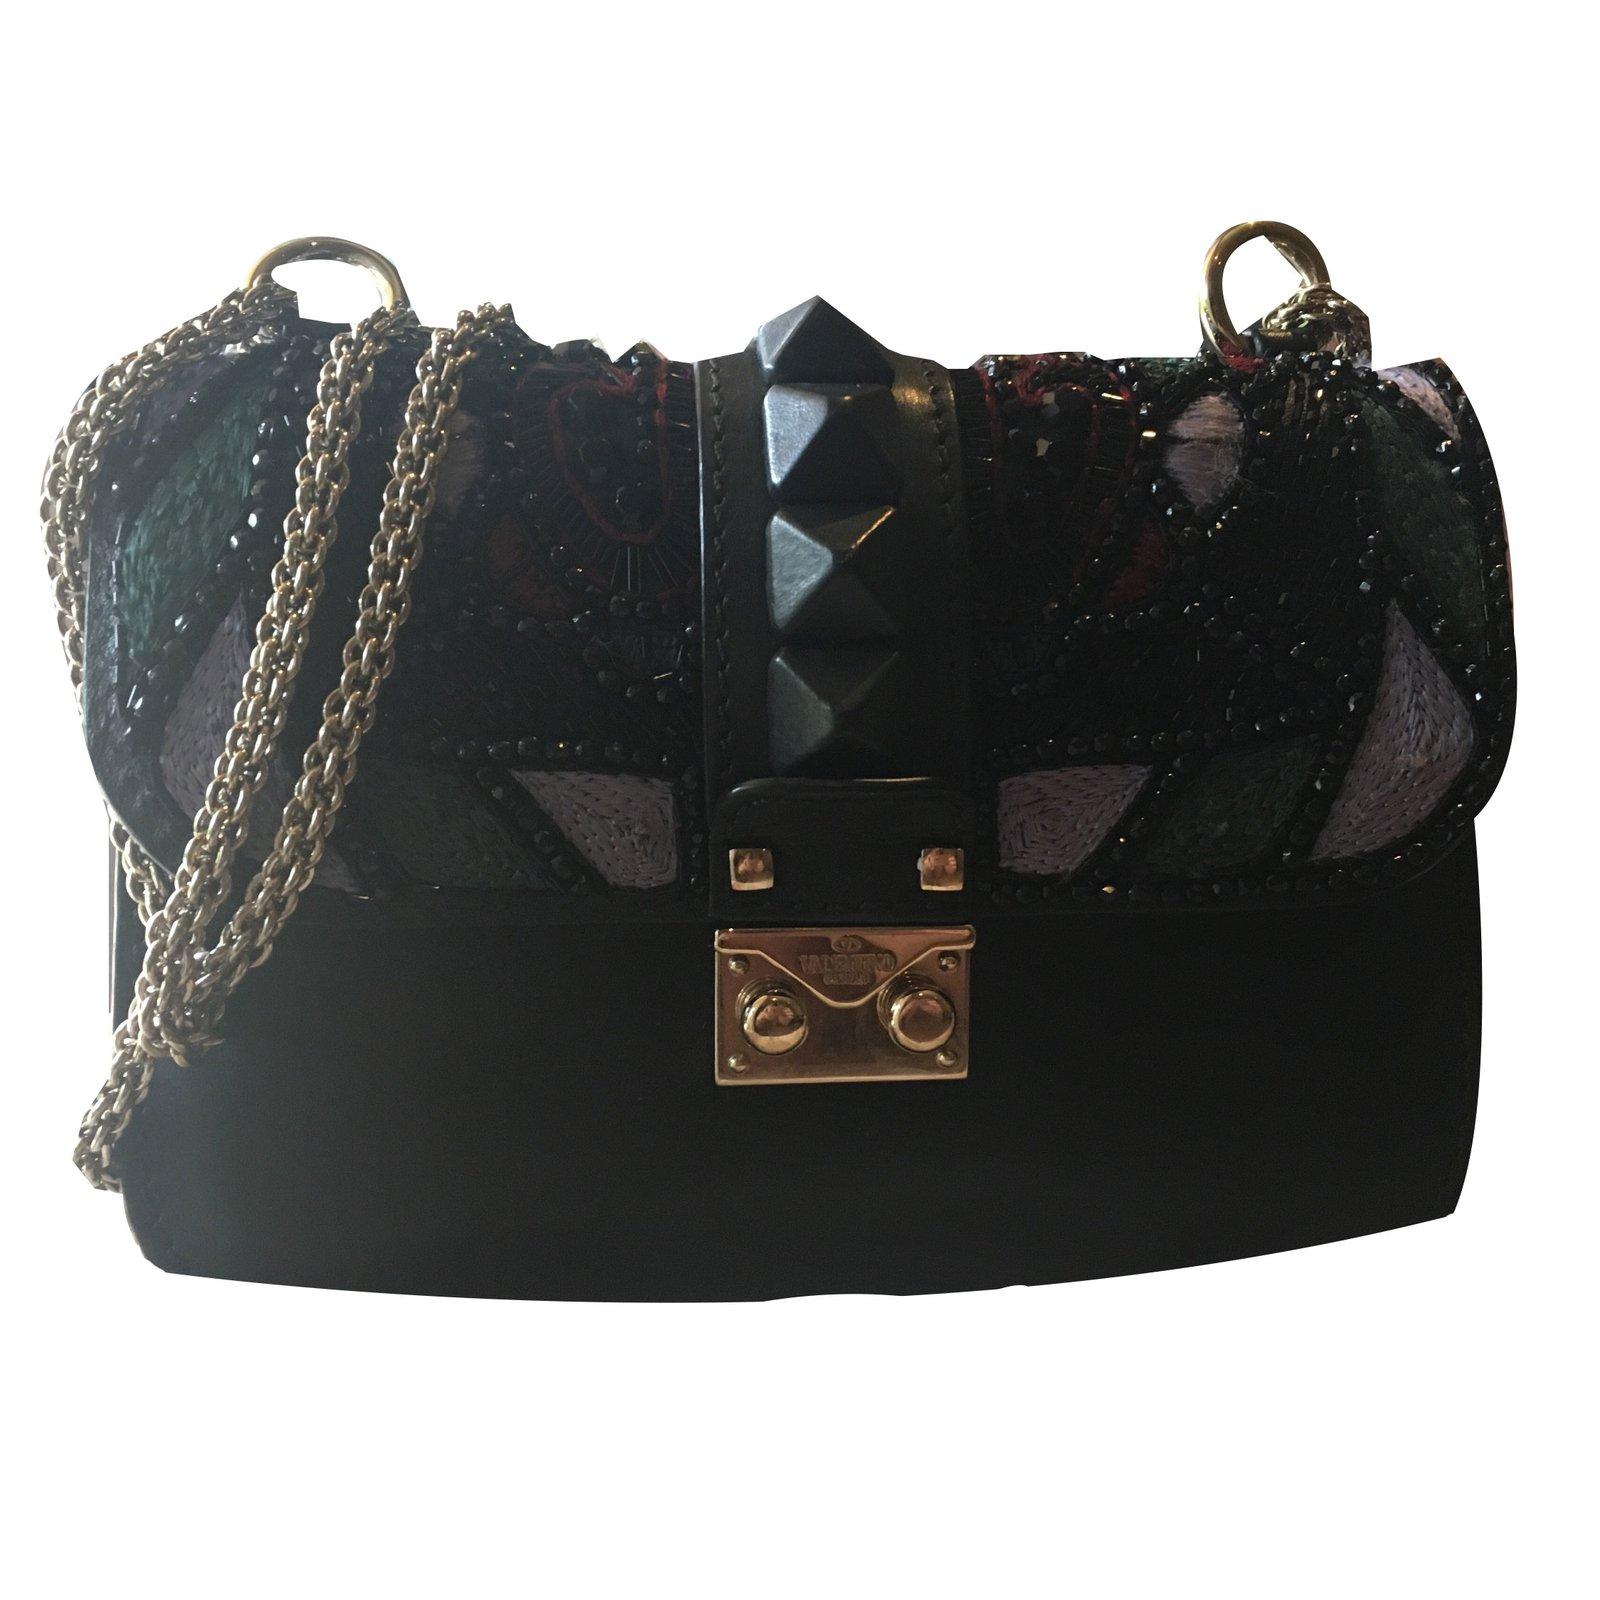 sacs main valentino glam lock cuir perle noir multicolore joli closet. Black Bedroom Furniture Sets. Home Design Ideas